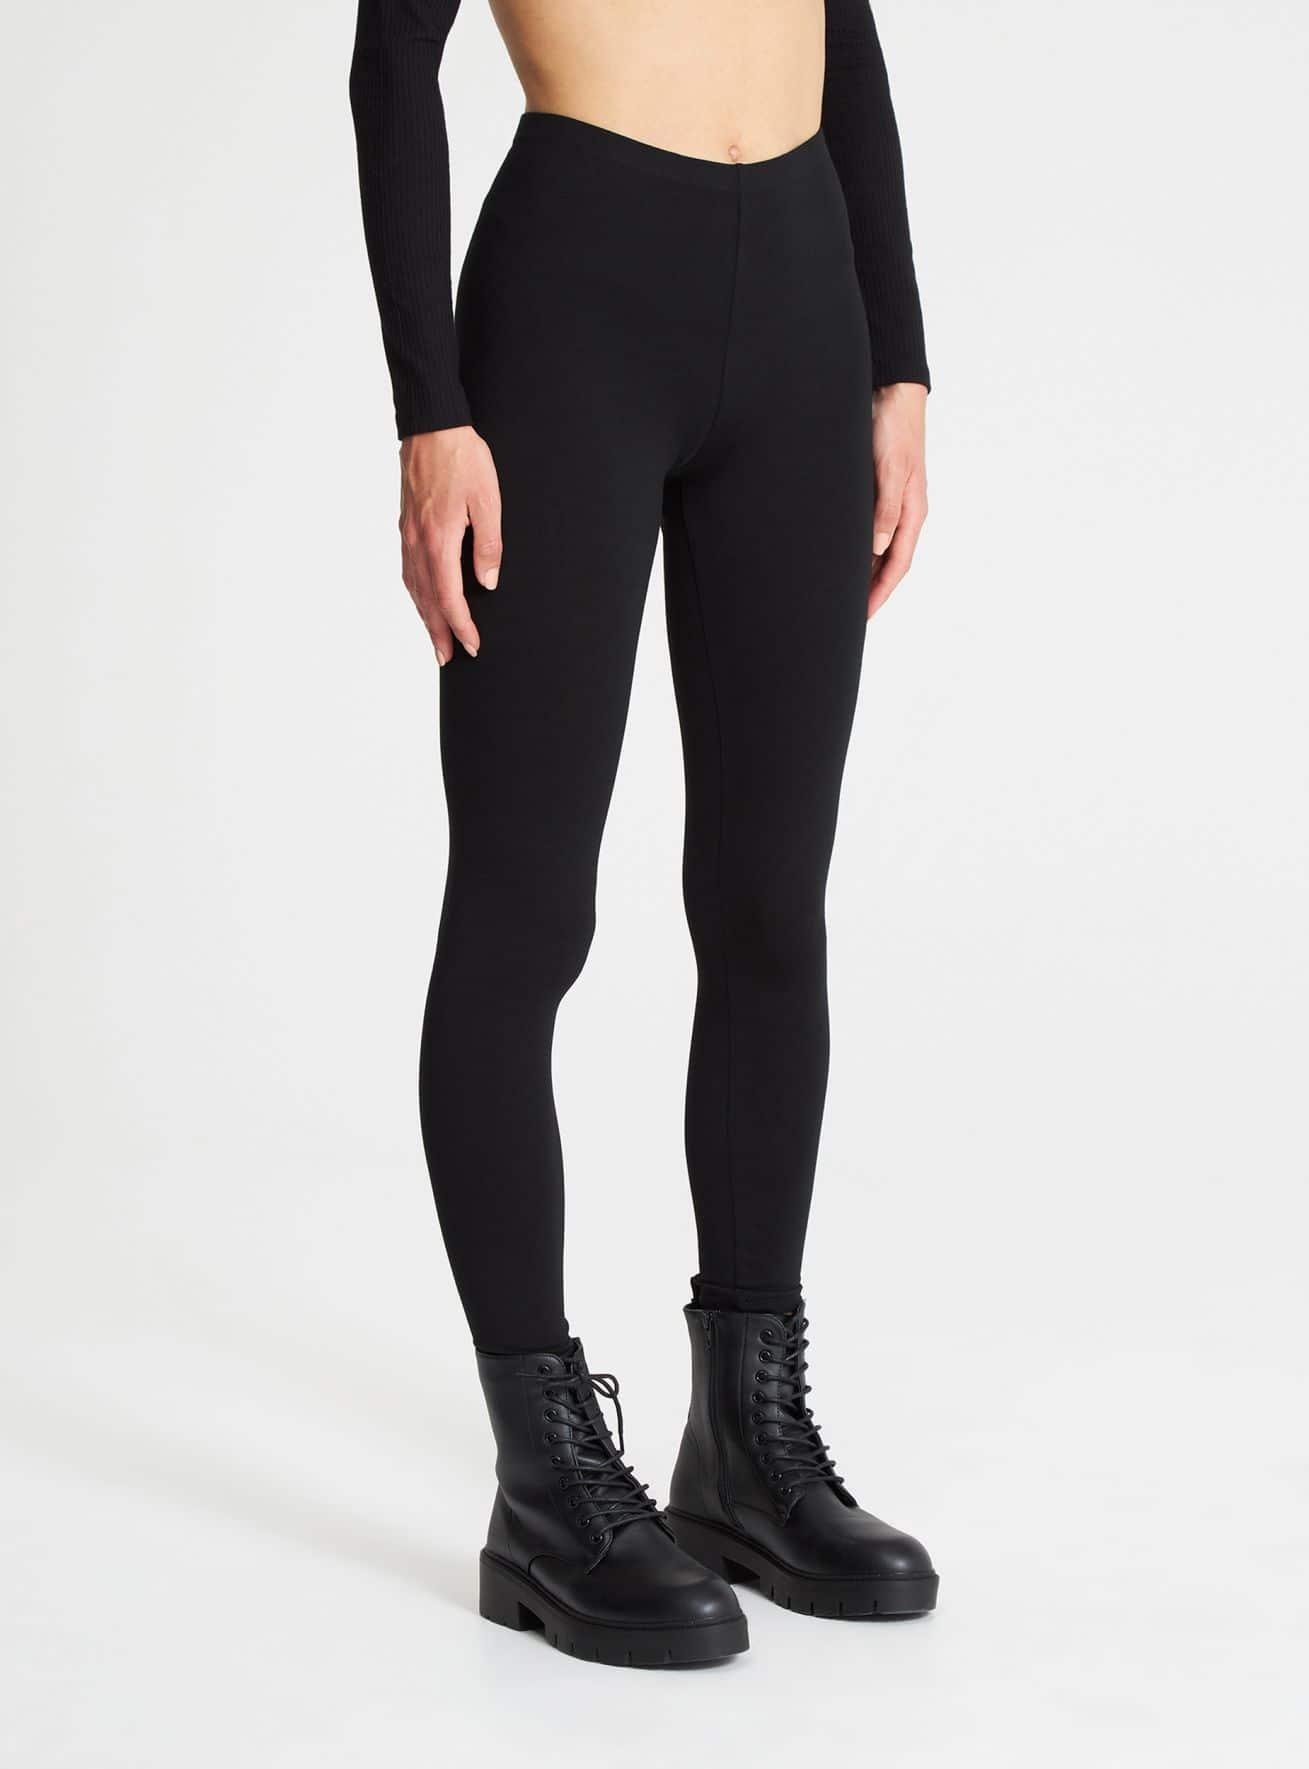 Leggings Lungo Mujer Terranova